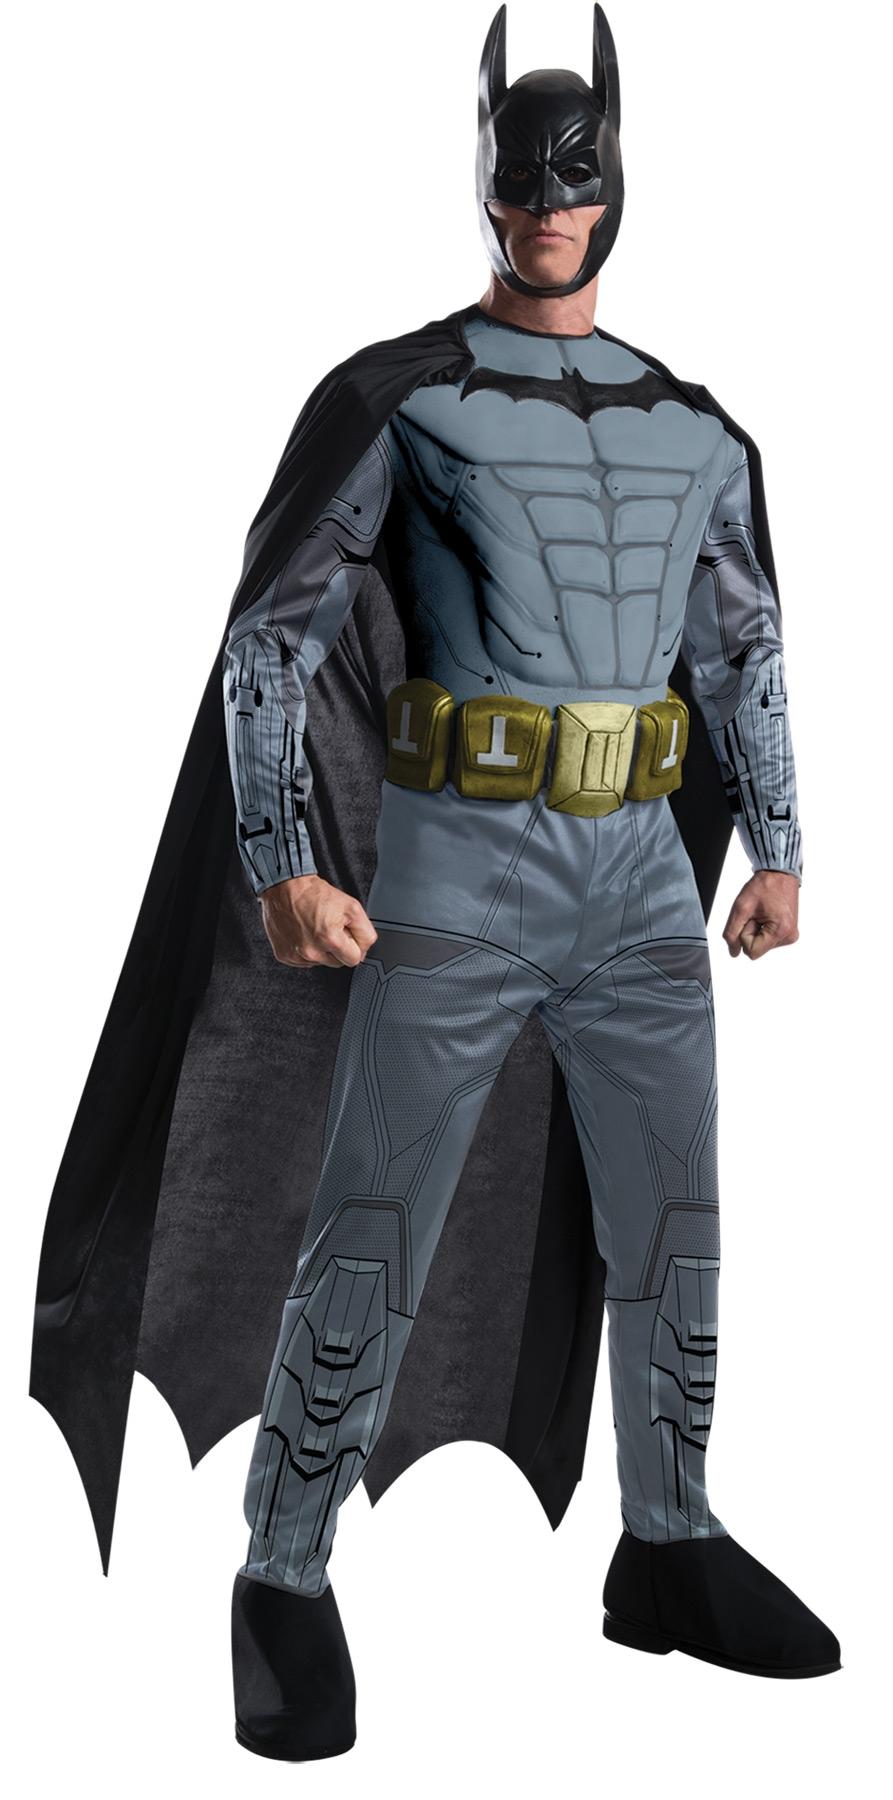 Костюм Бэтмена из Готема (48-50) - Супергерои и комиксы, р.48-50